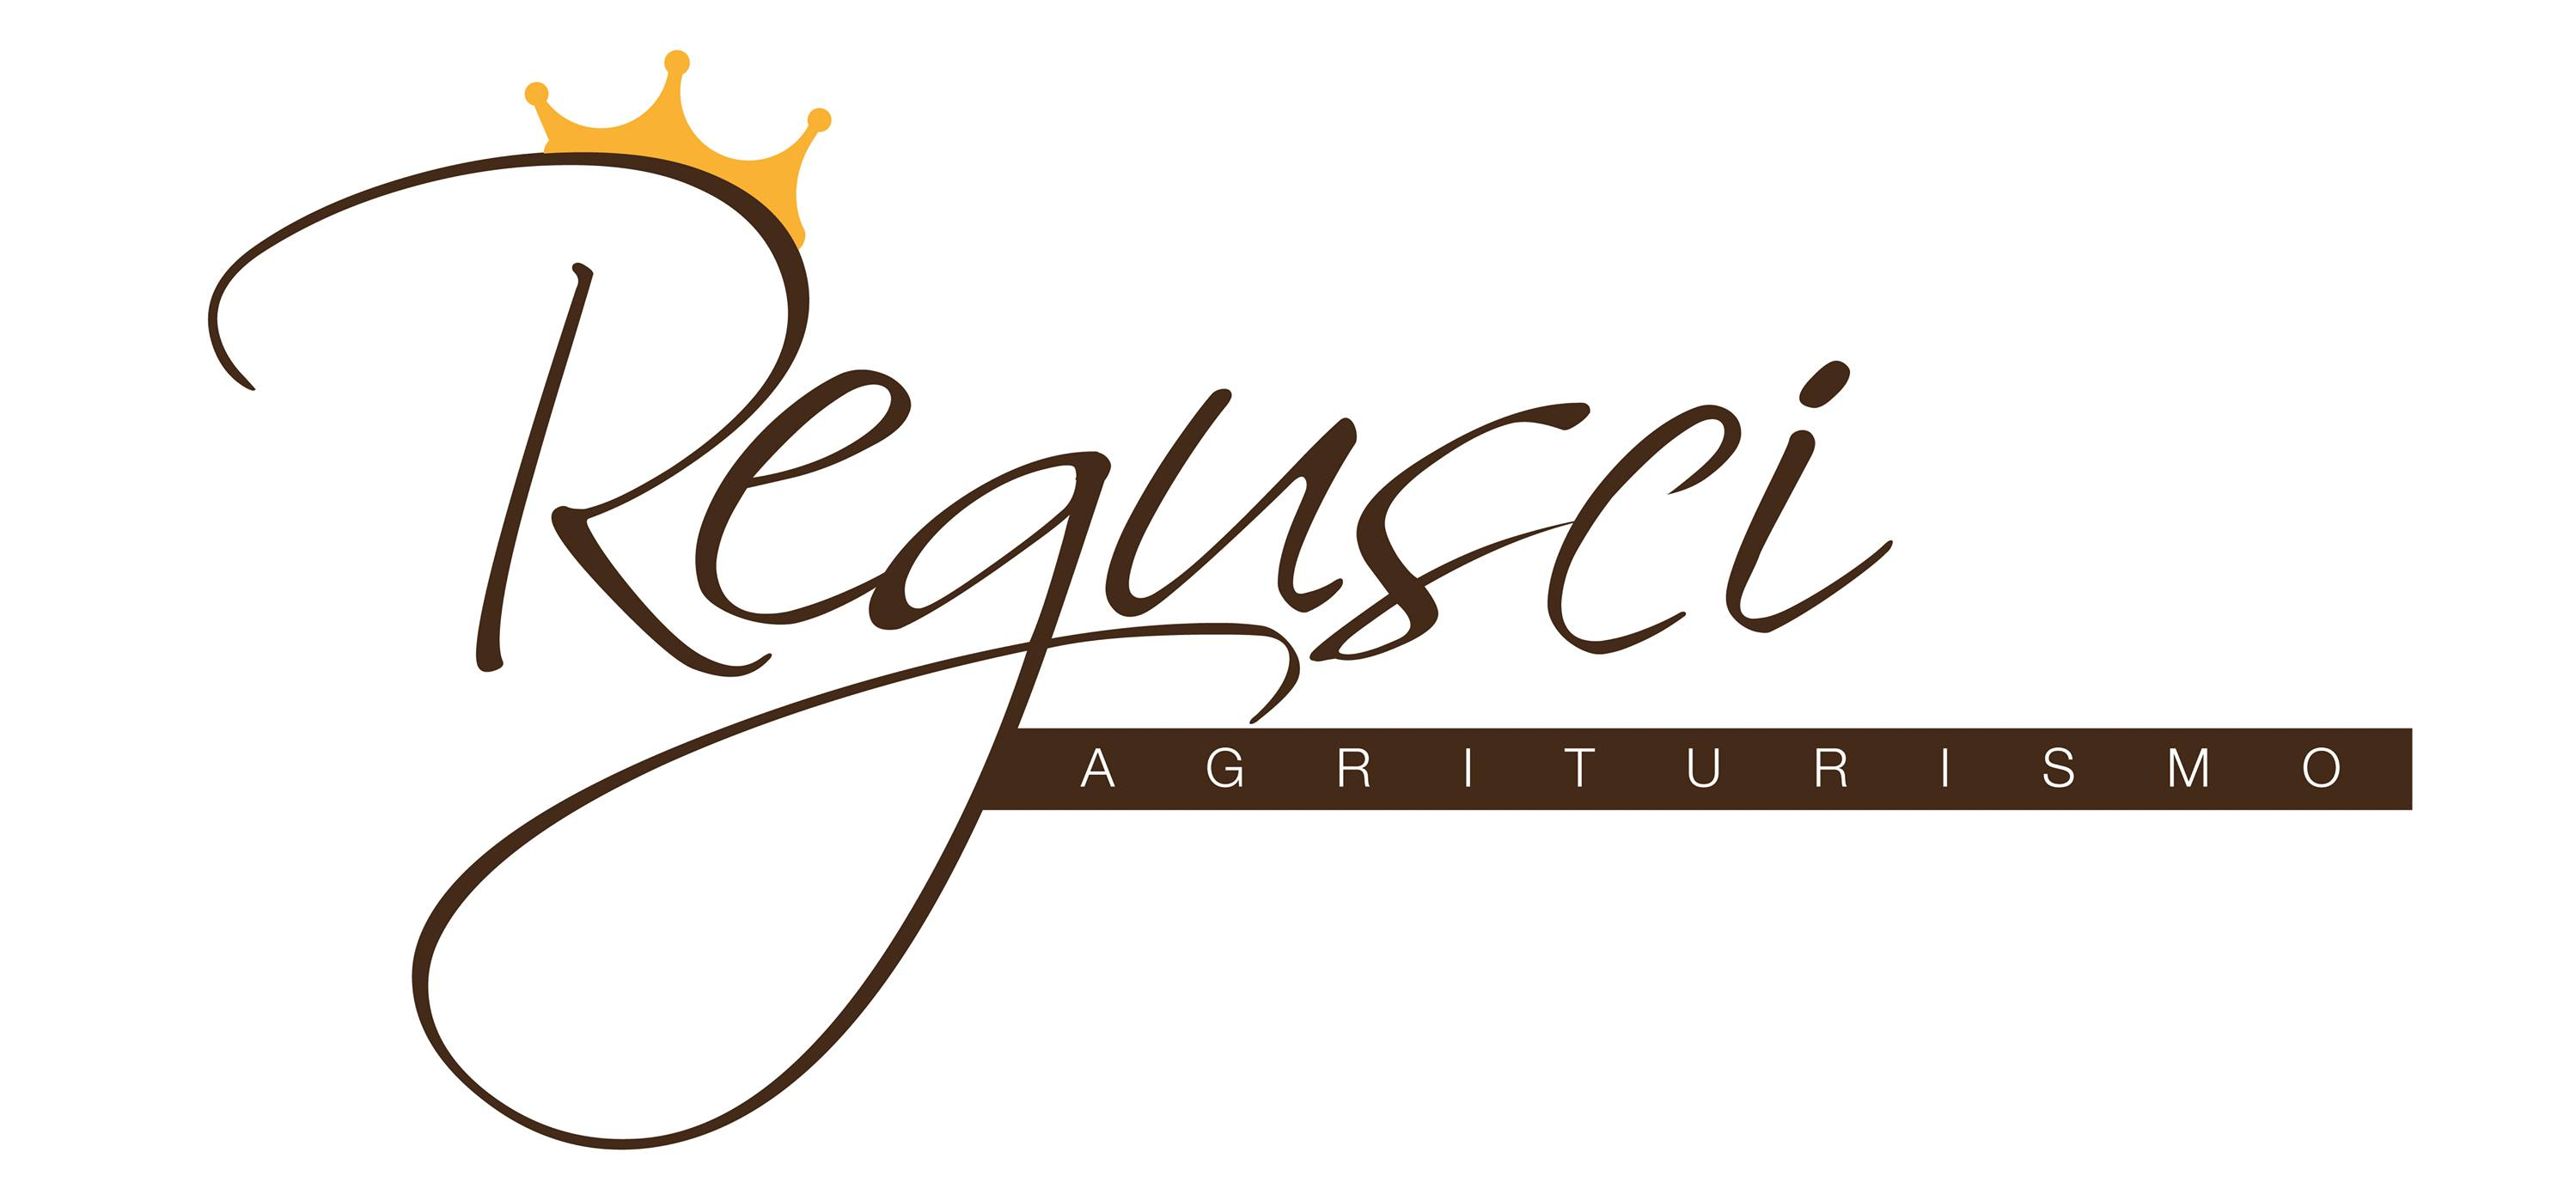 Food restaurant Agriturismo Regusci Camorino Switzerland Ulocal local product local purchase